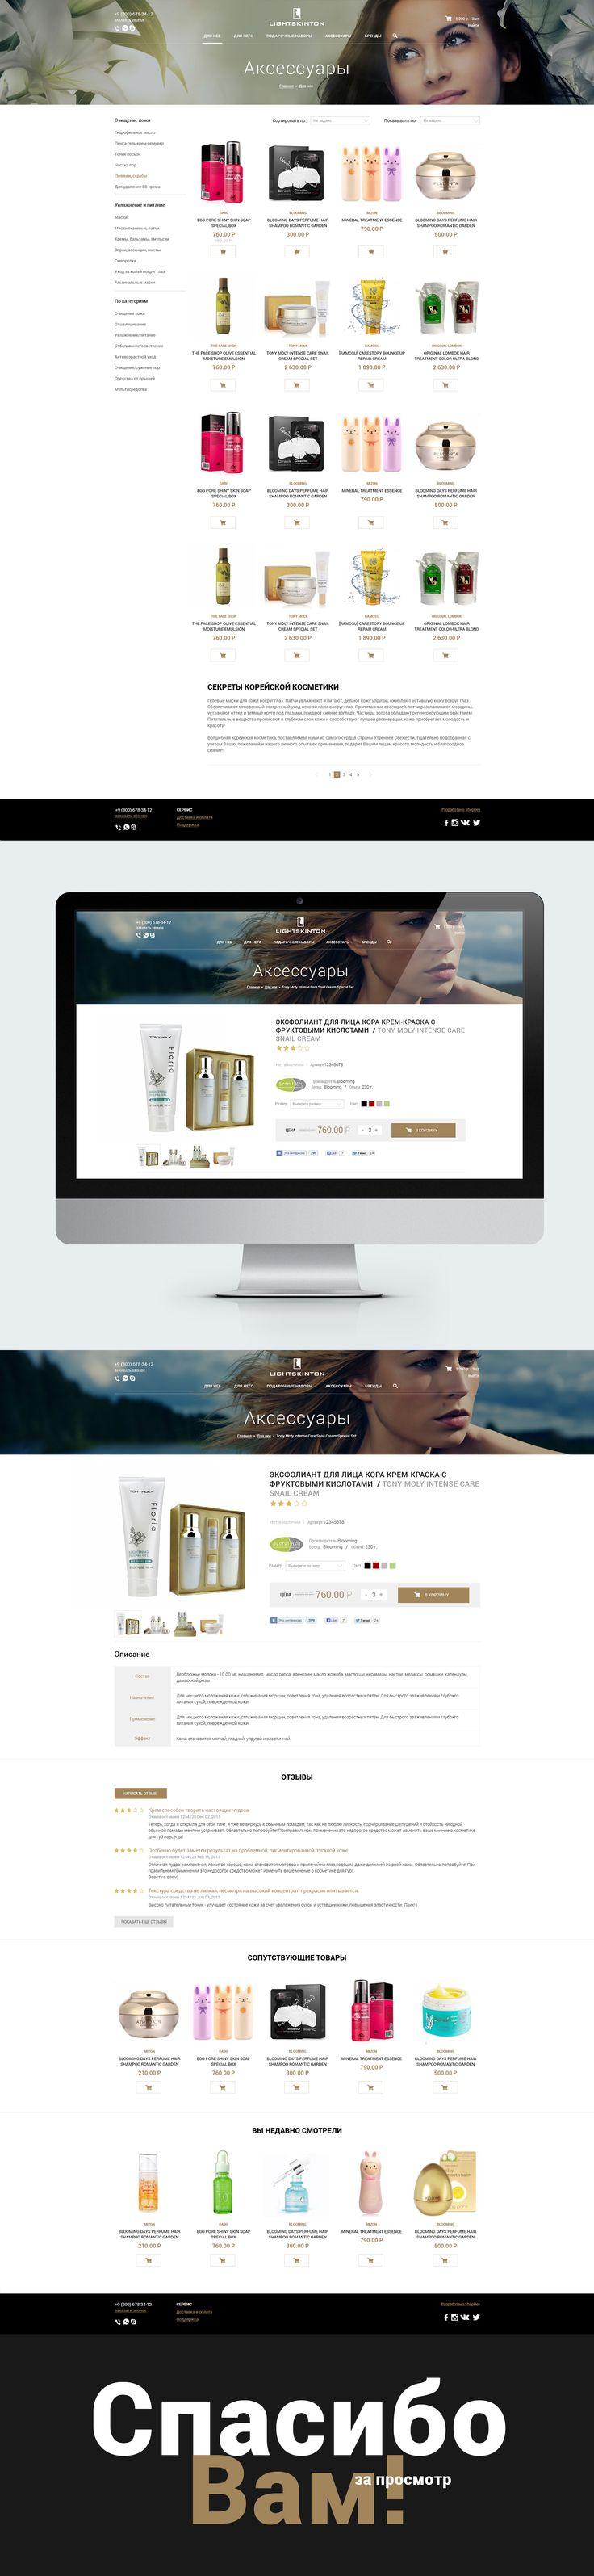 Online cosmetics store. Web design, Opencart. Создание Интернет-магазина корейской косметики. Веб дизайн. #eCommerce